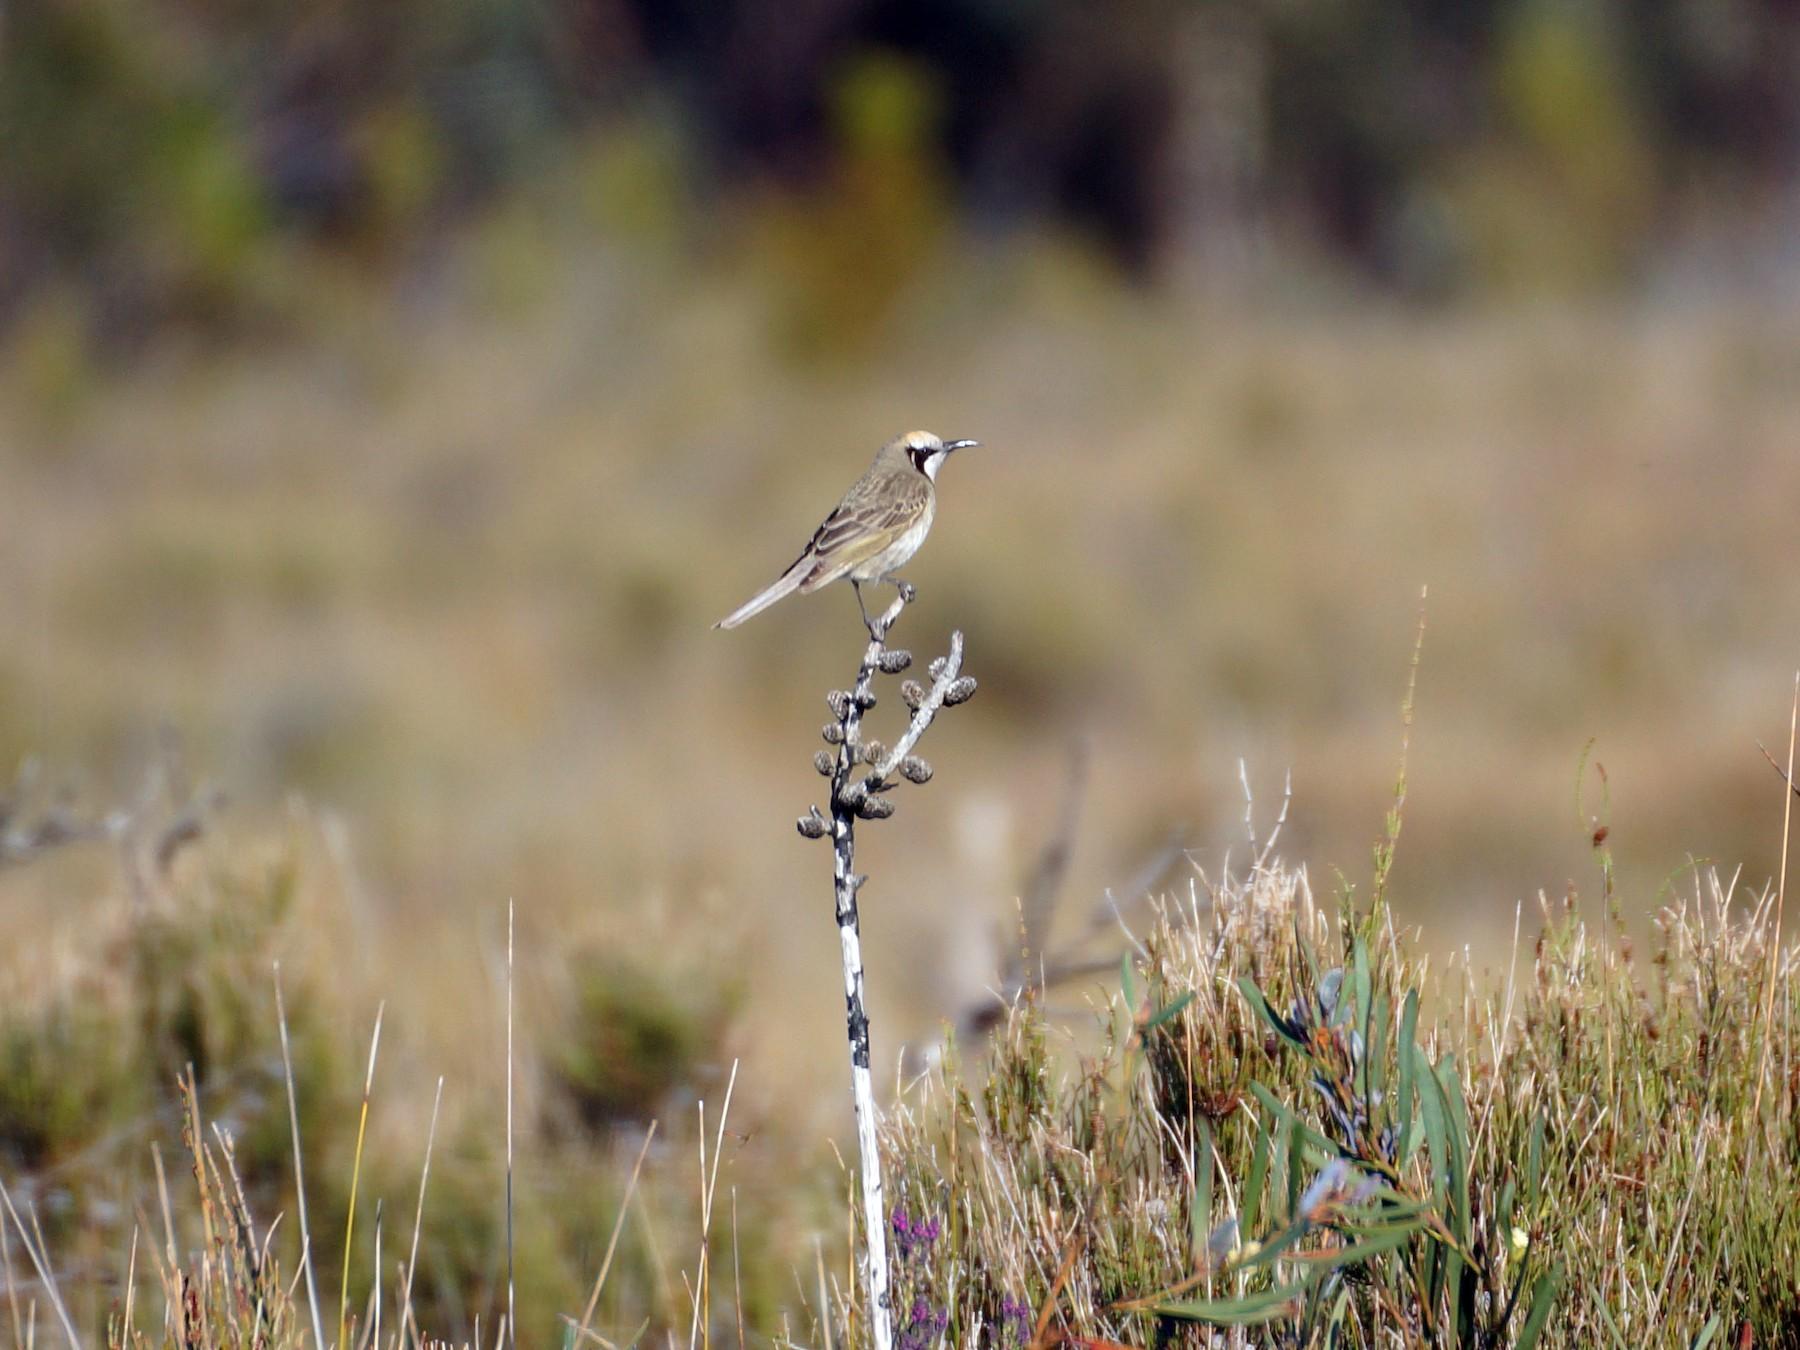 Tawny-crowned Honeyeater - Aiden Worseldine